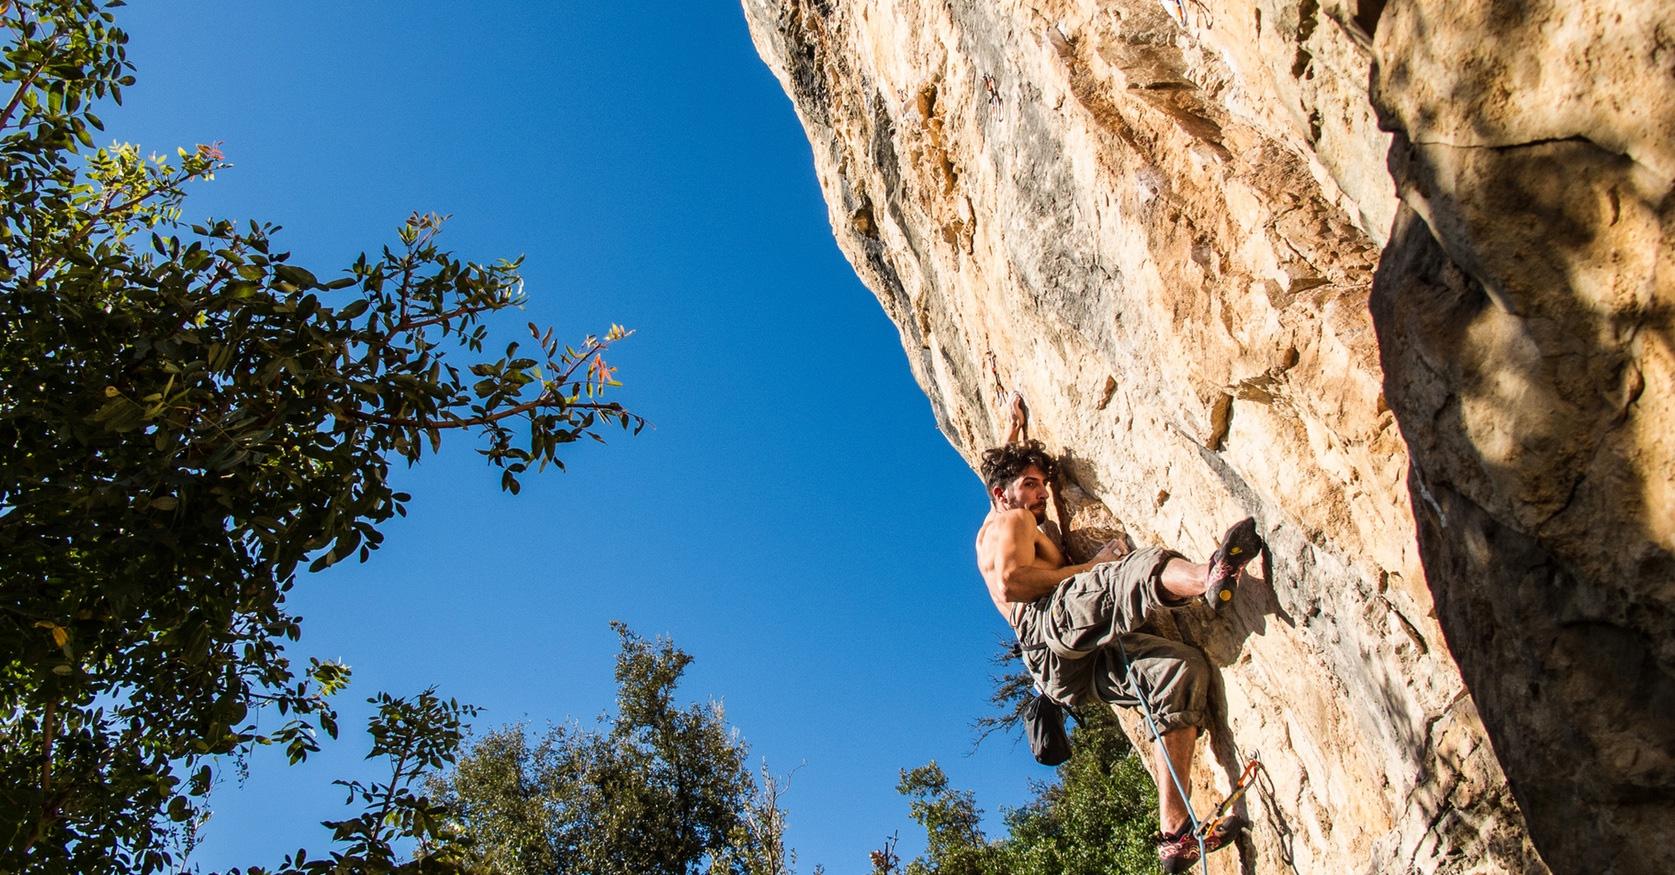 rock-climber-no-words.jpg